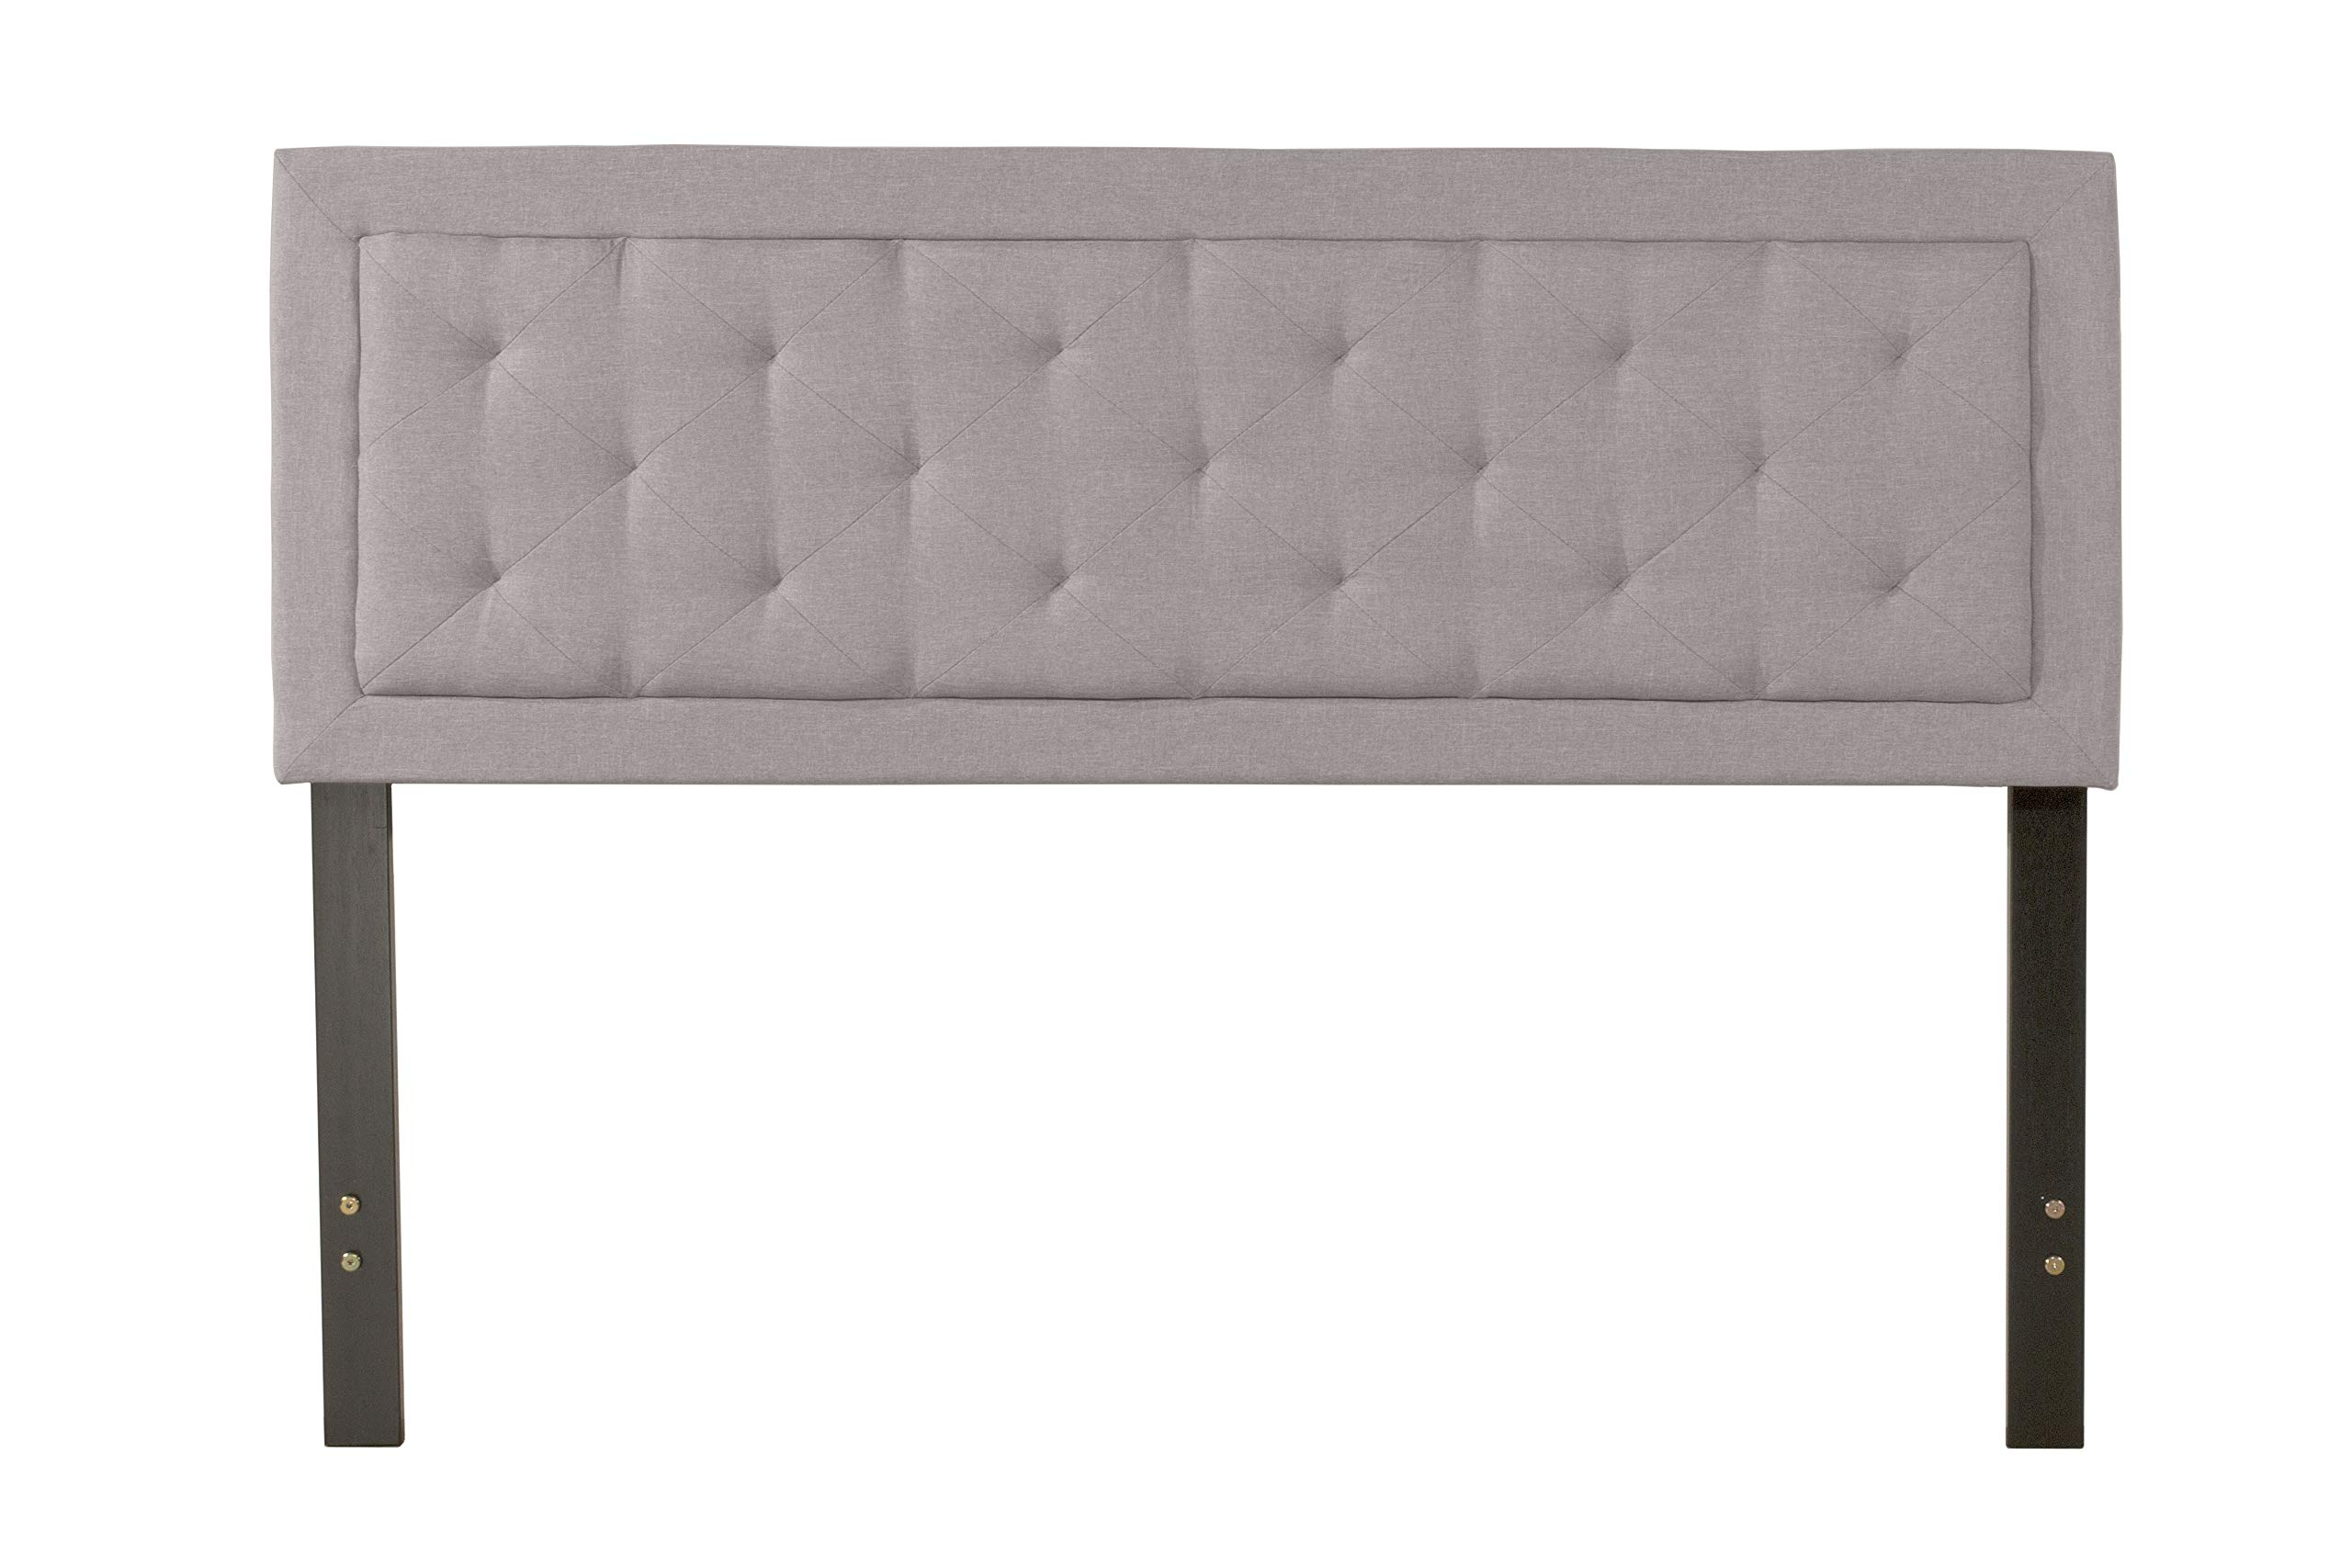 Hillsdale Furniture La Croix Headboard Without Frame, Full/Queen, Glacier Gray